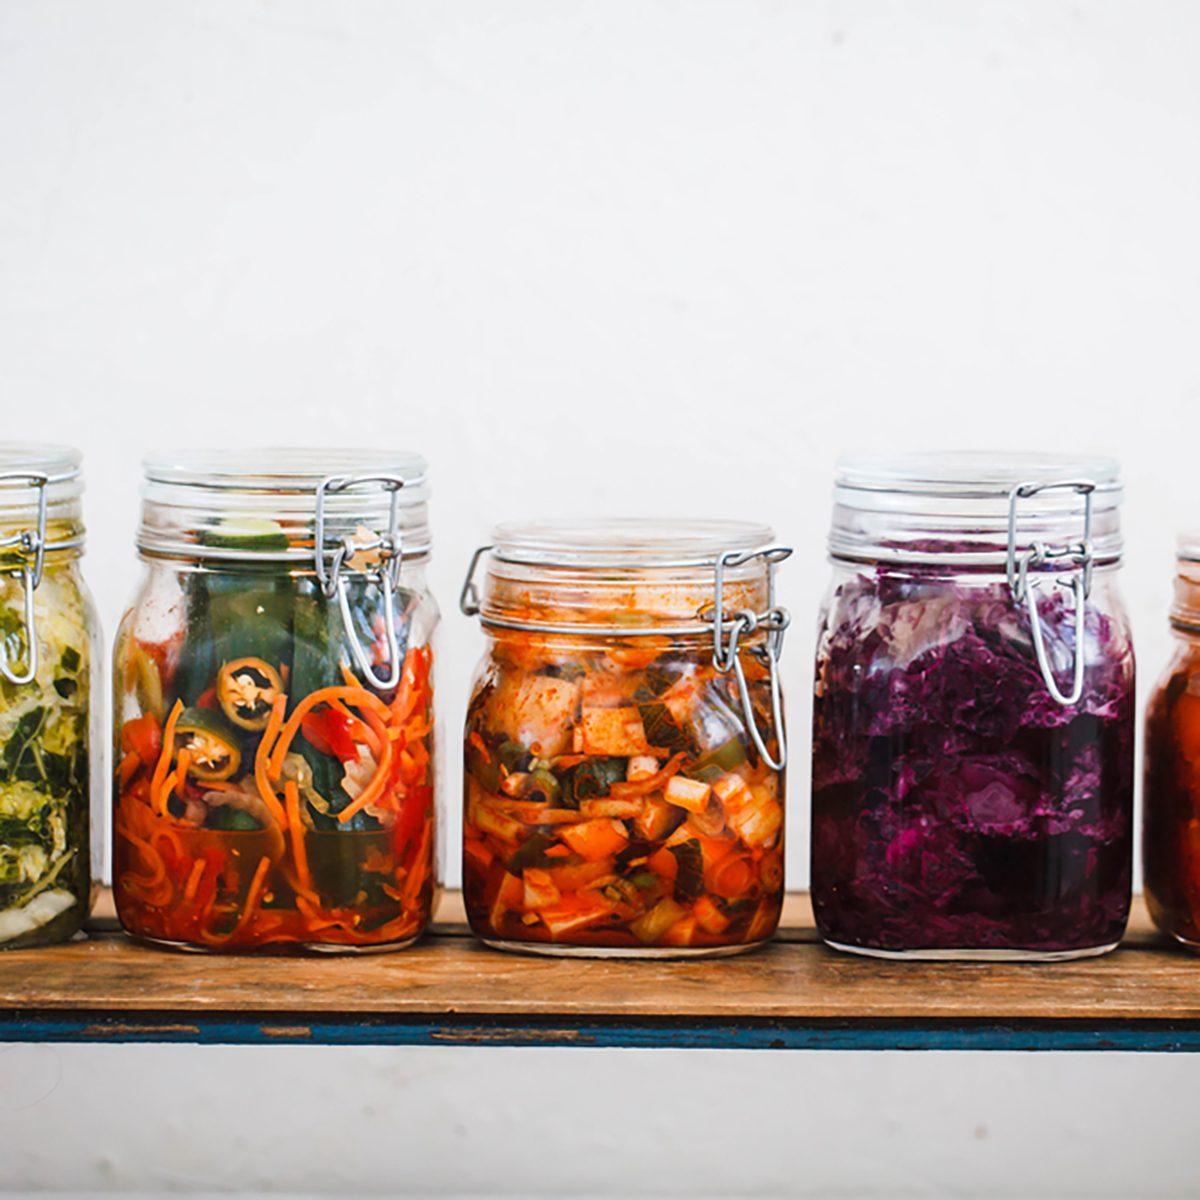 Variety kimchi masson jars.